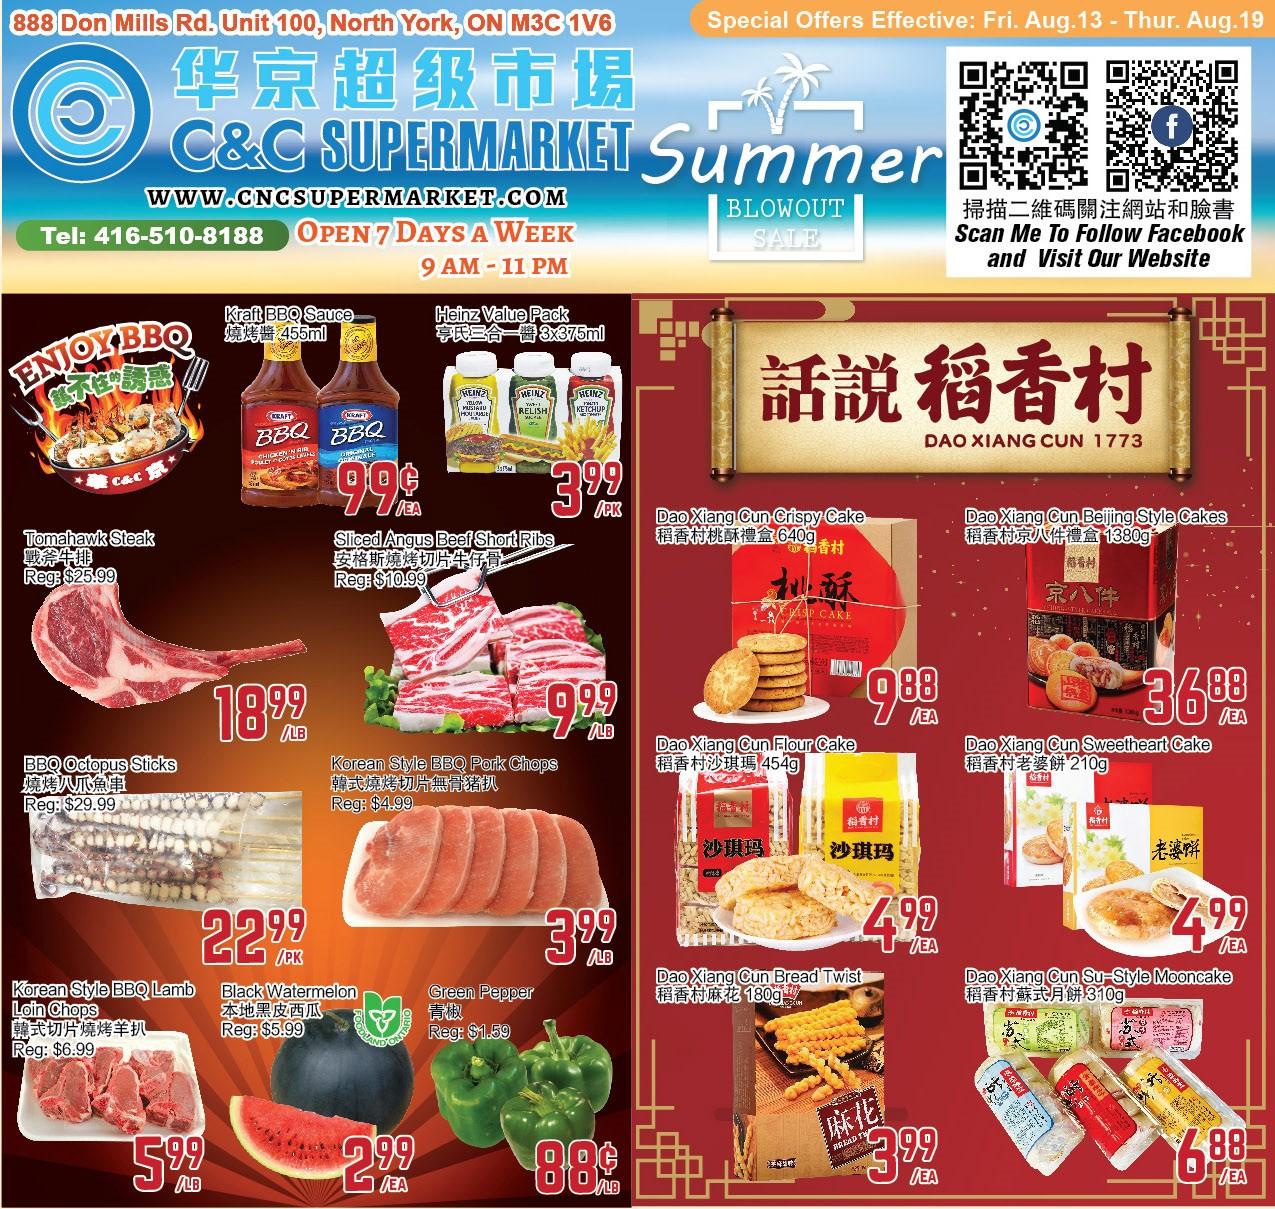 C&C Supermarket Flyer | Aug 13